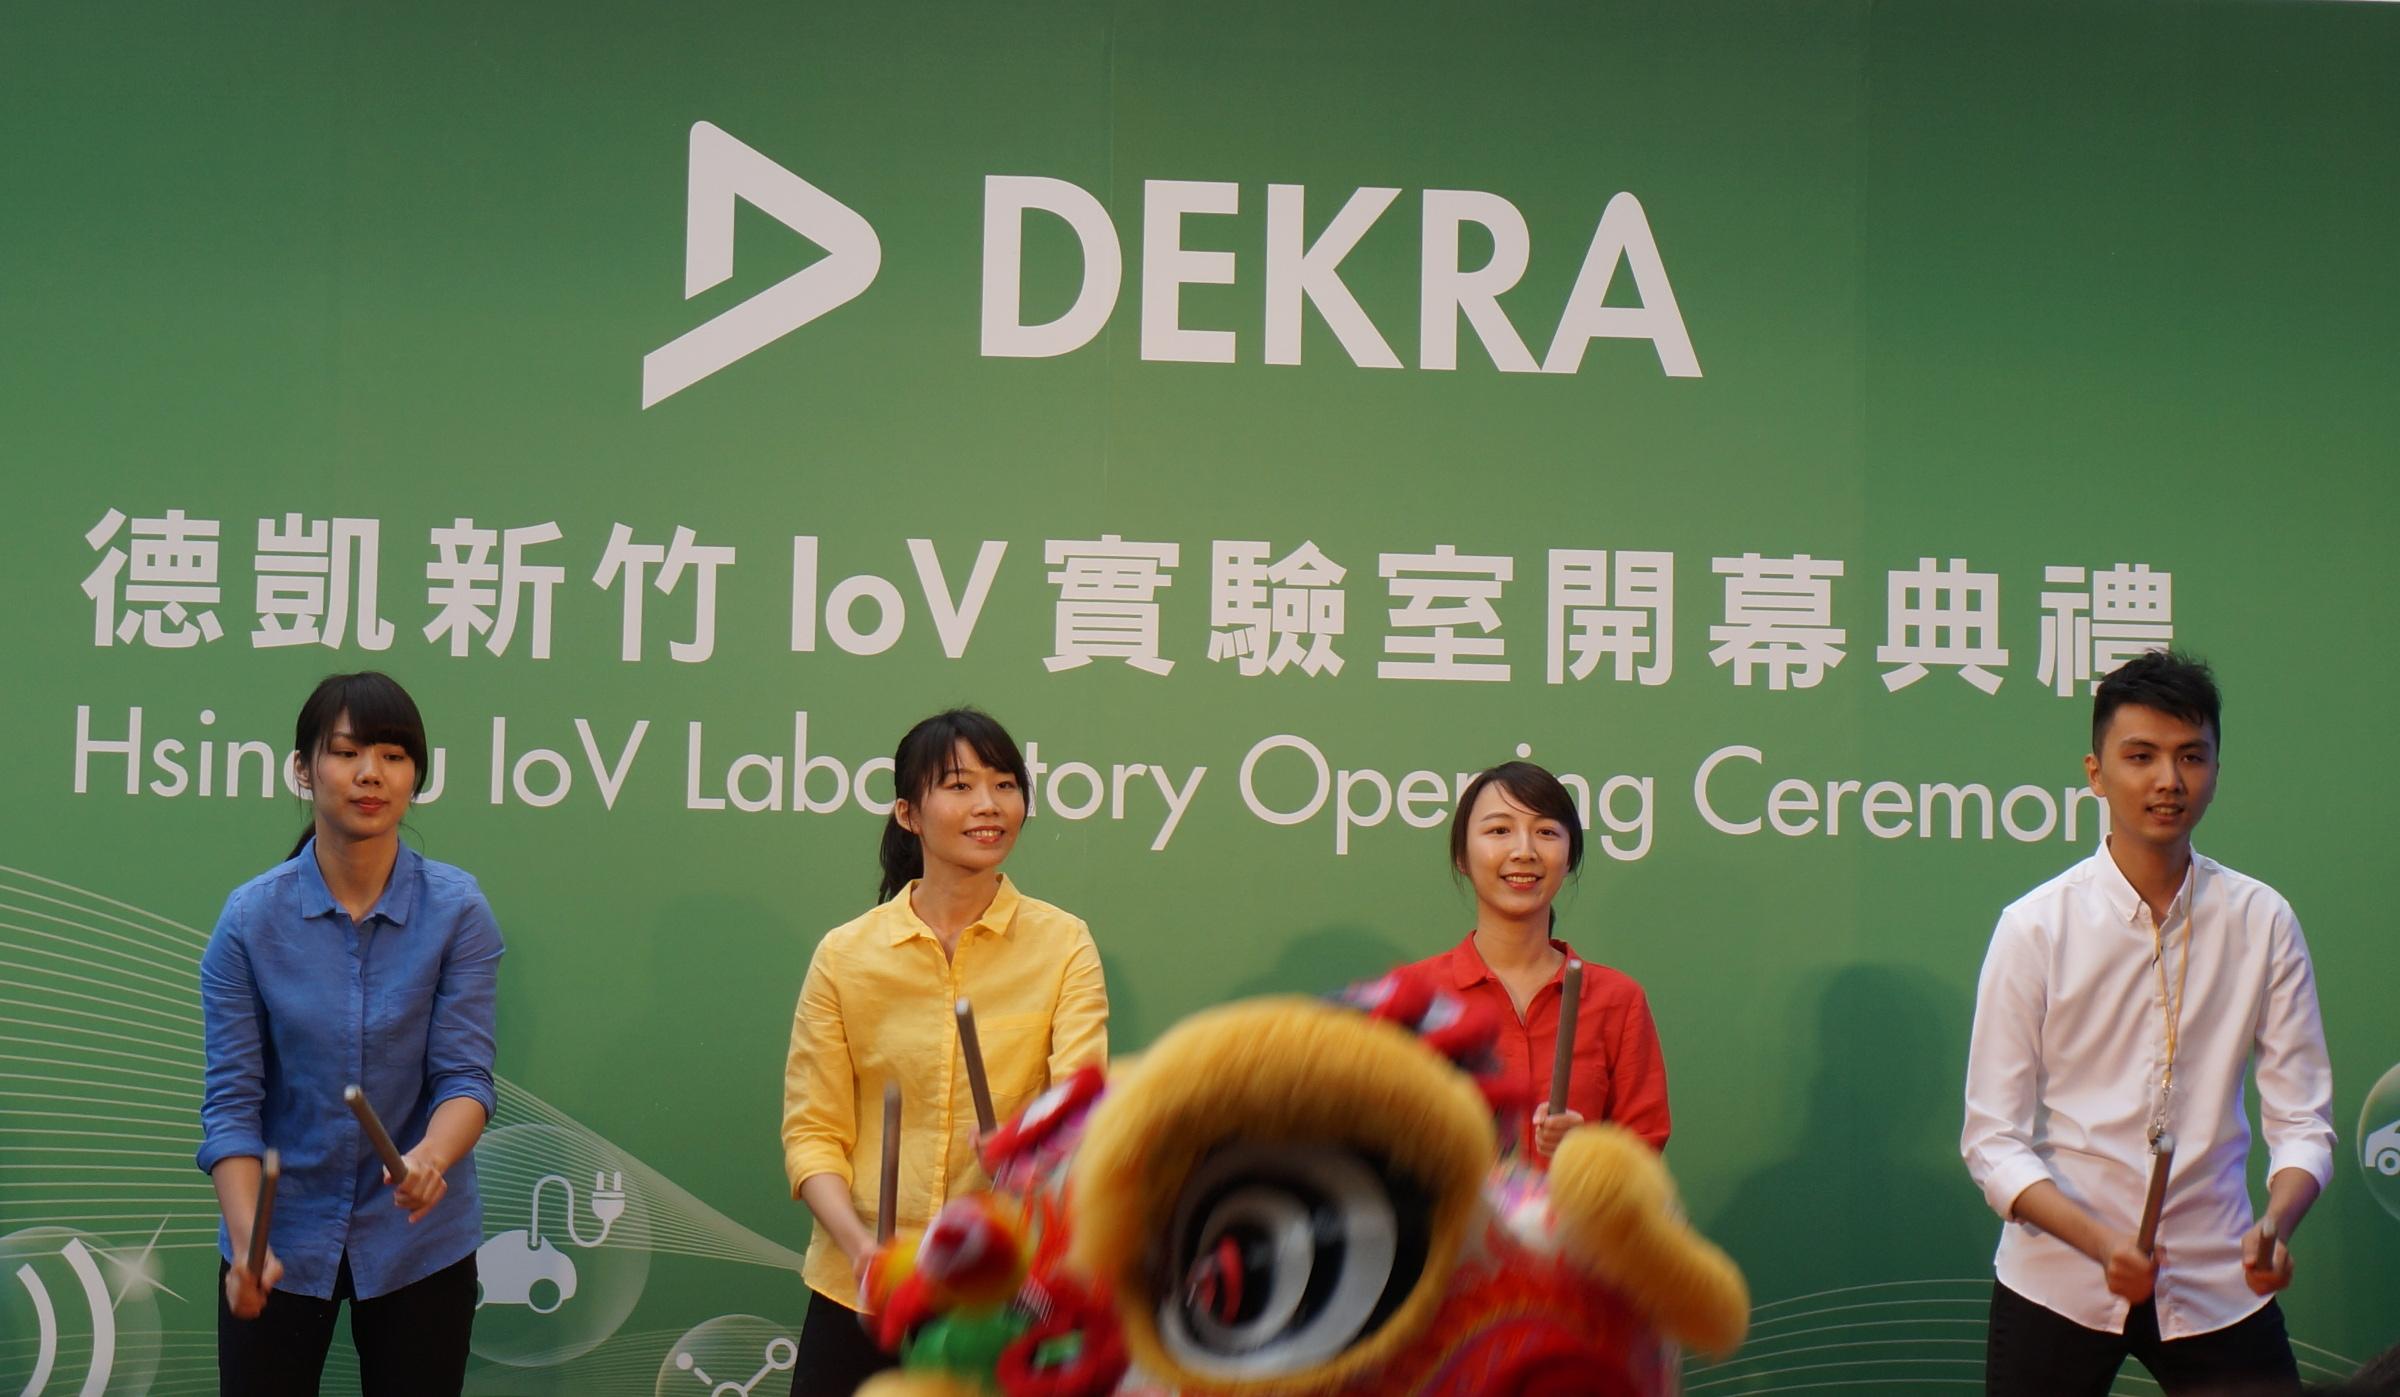 DEKRA-2017-IoV-performance